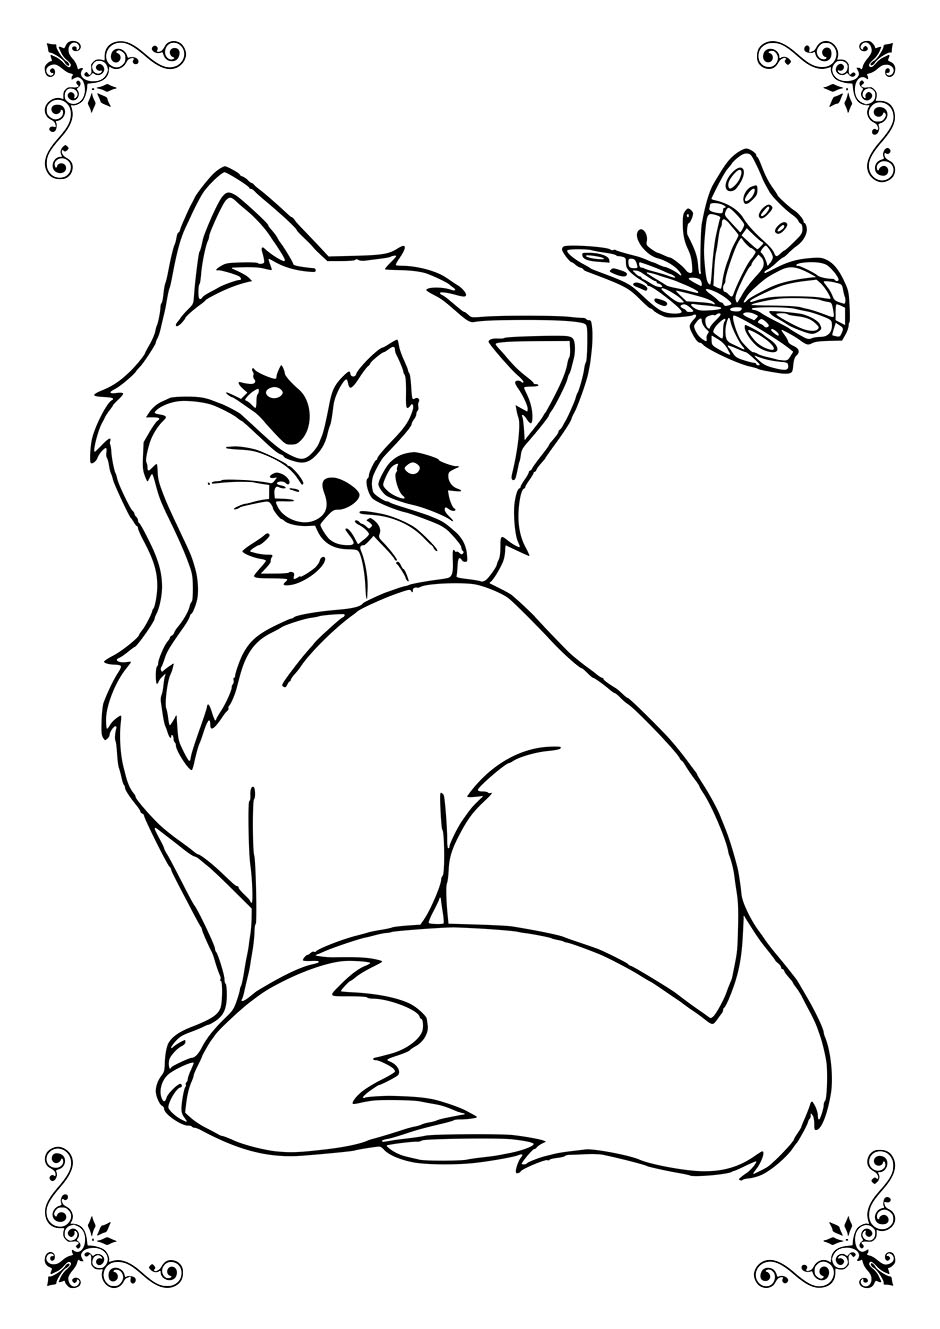 Раскраска: кошка с бабочкой — raskraski-a4.ru